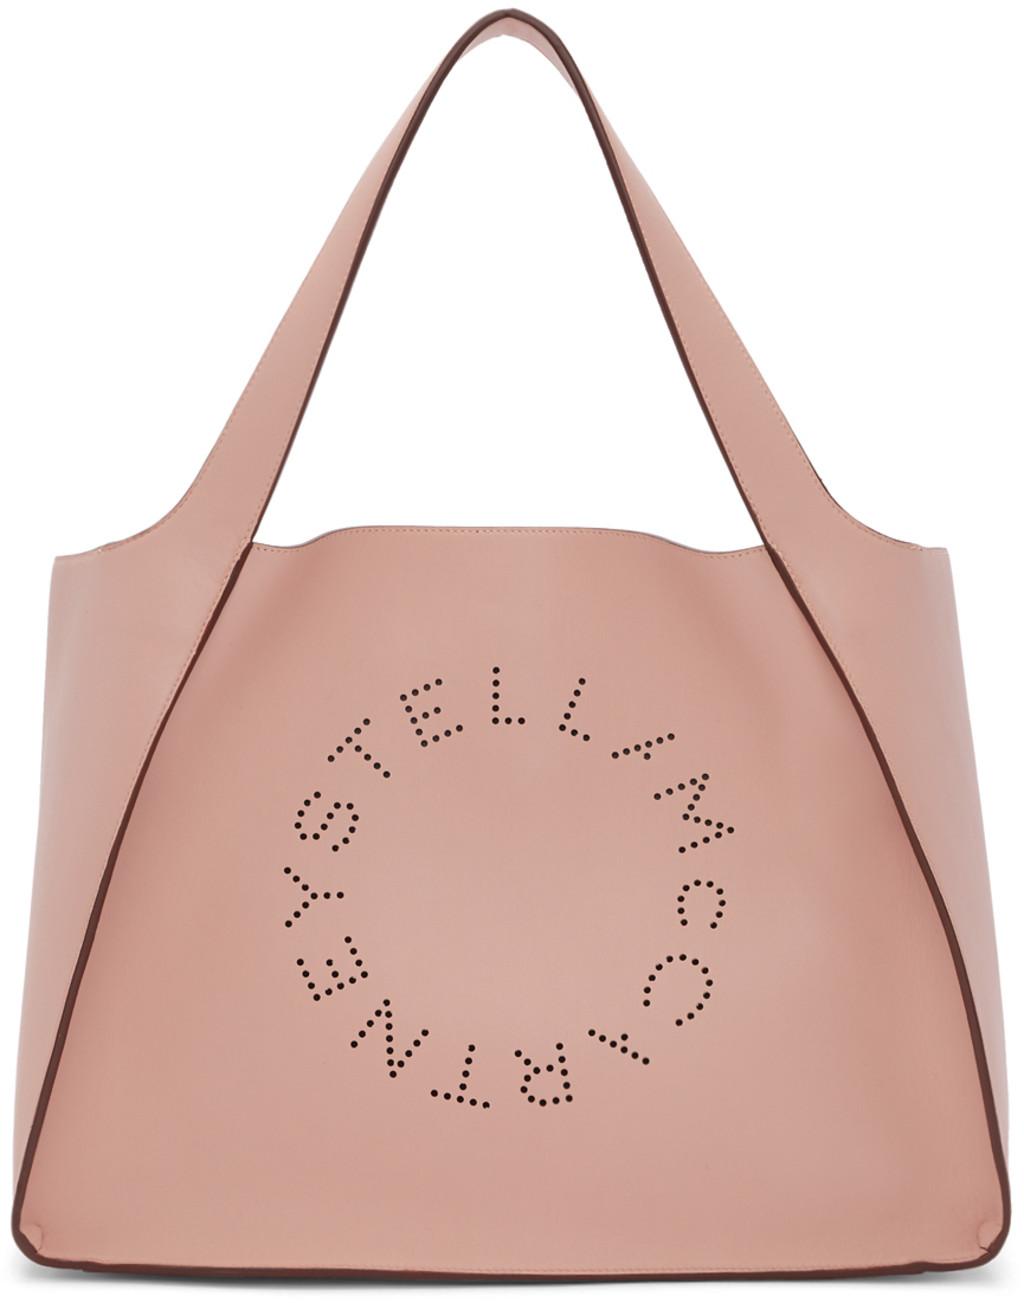 Stella Mccartney bags for Women   SSENSE 9c631b8956